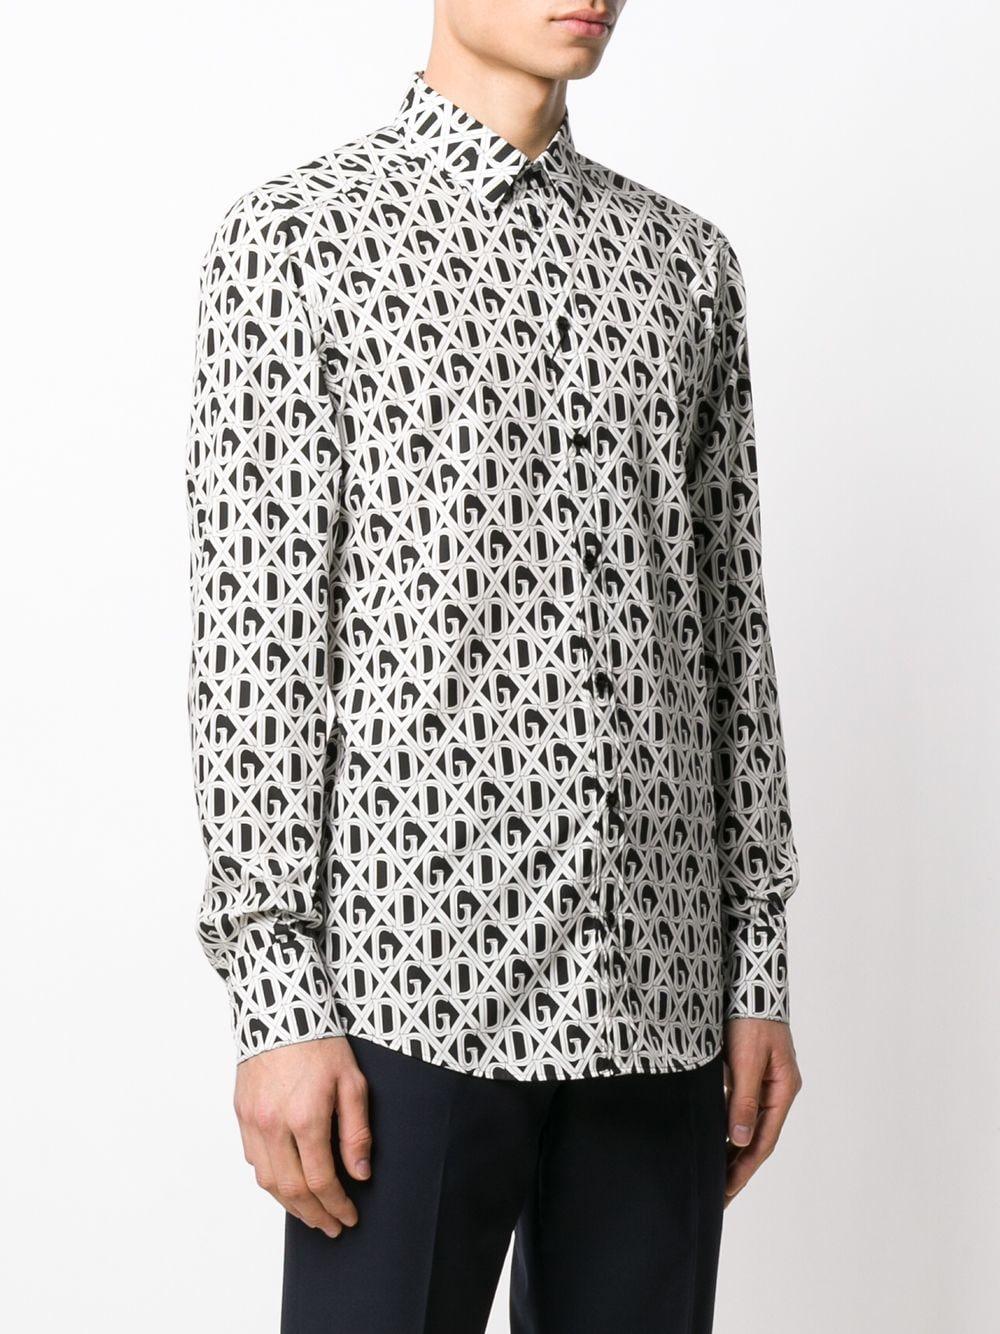 monogram black and white cotton shirt with diamond check logomania print  DOLCE & GABBANA |  | G5EJ0T-HS5FUHN67C